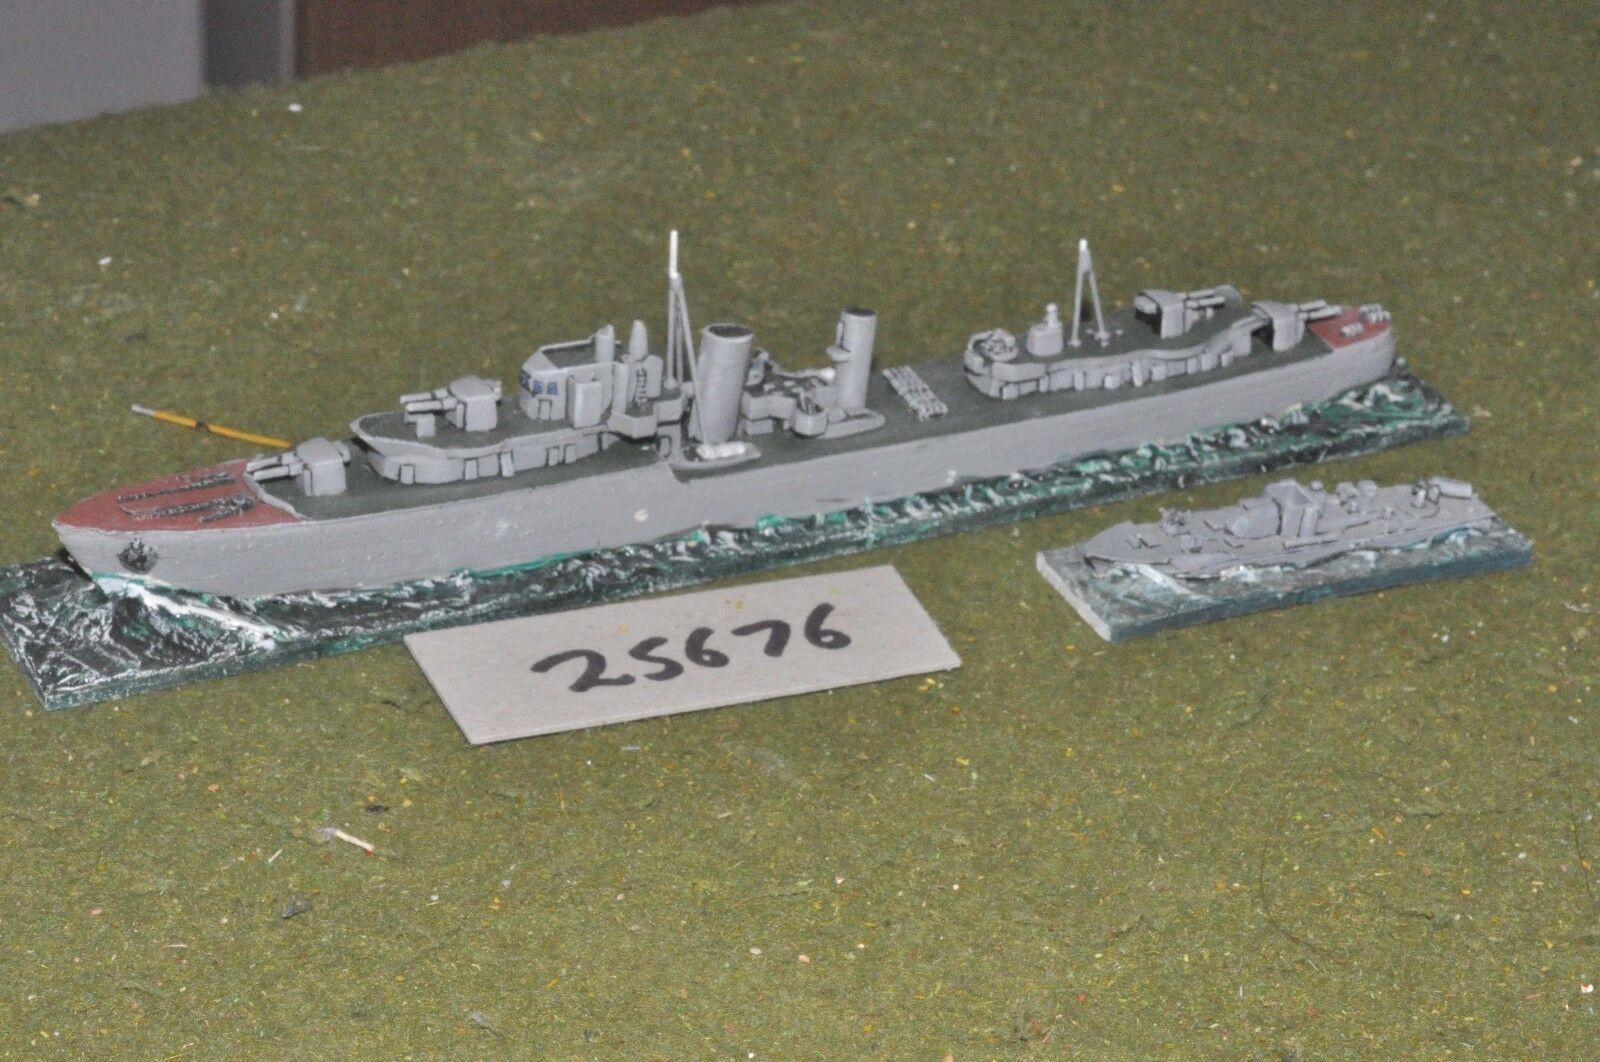 1 700 WW2   british - coastal 2 figures - ships (25676)